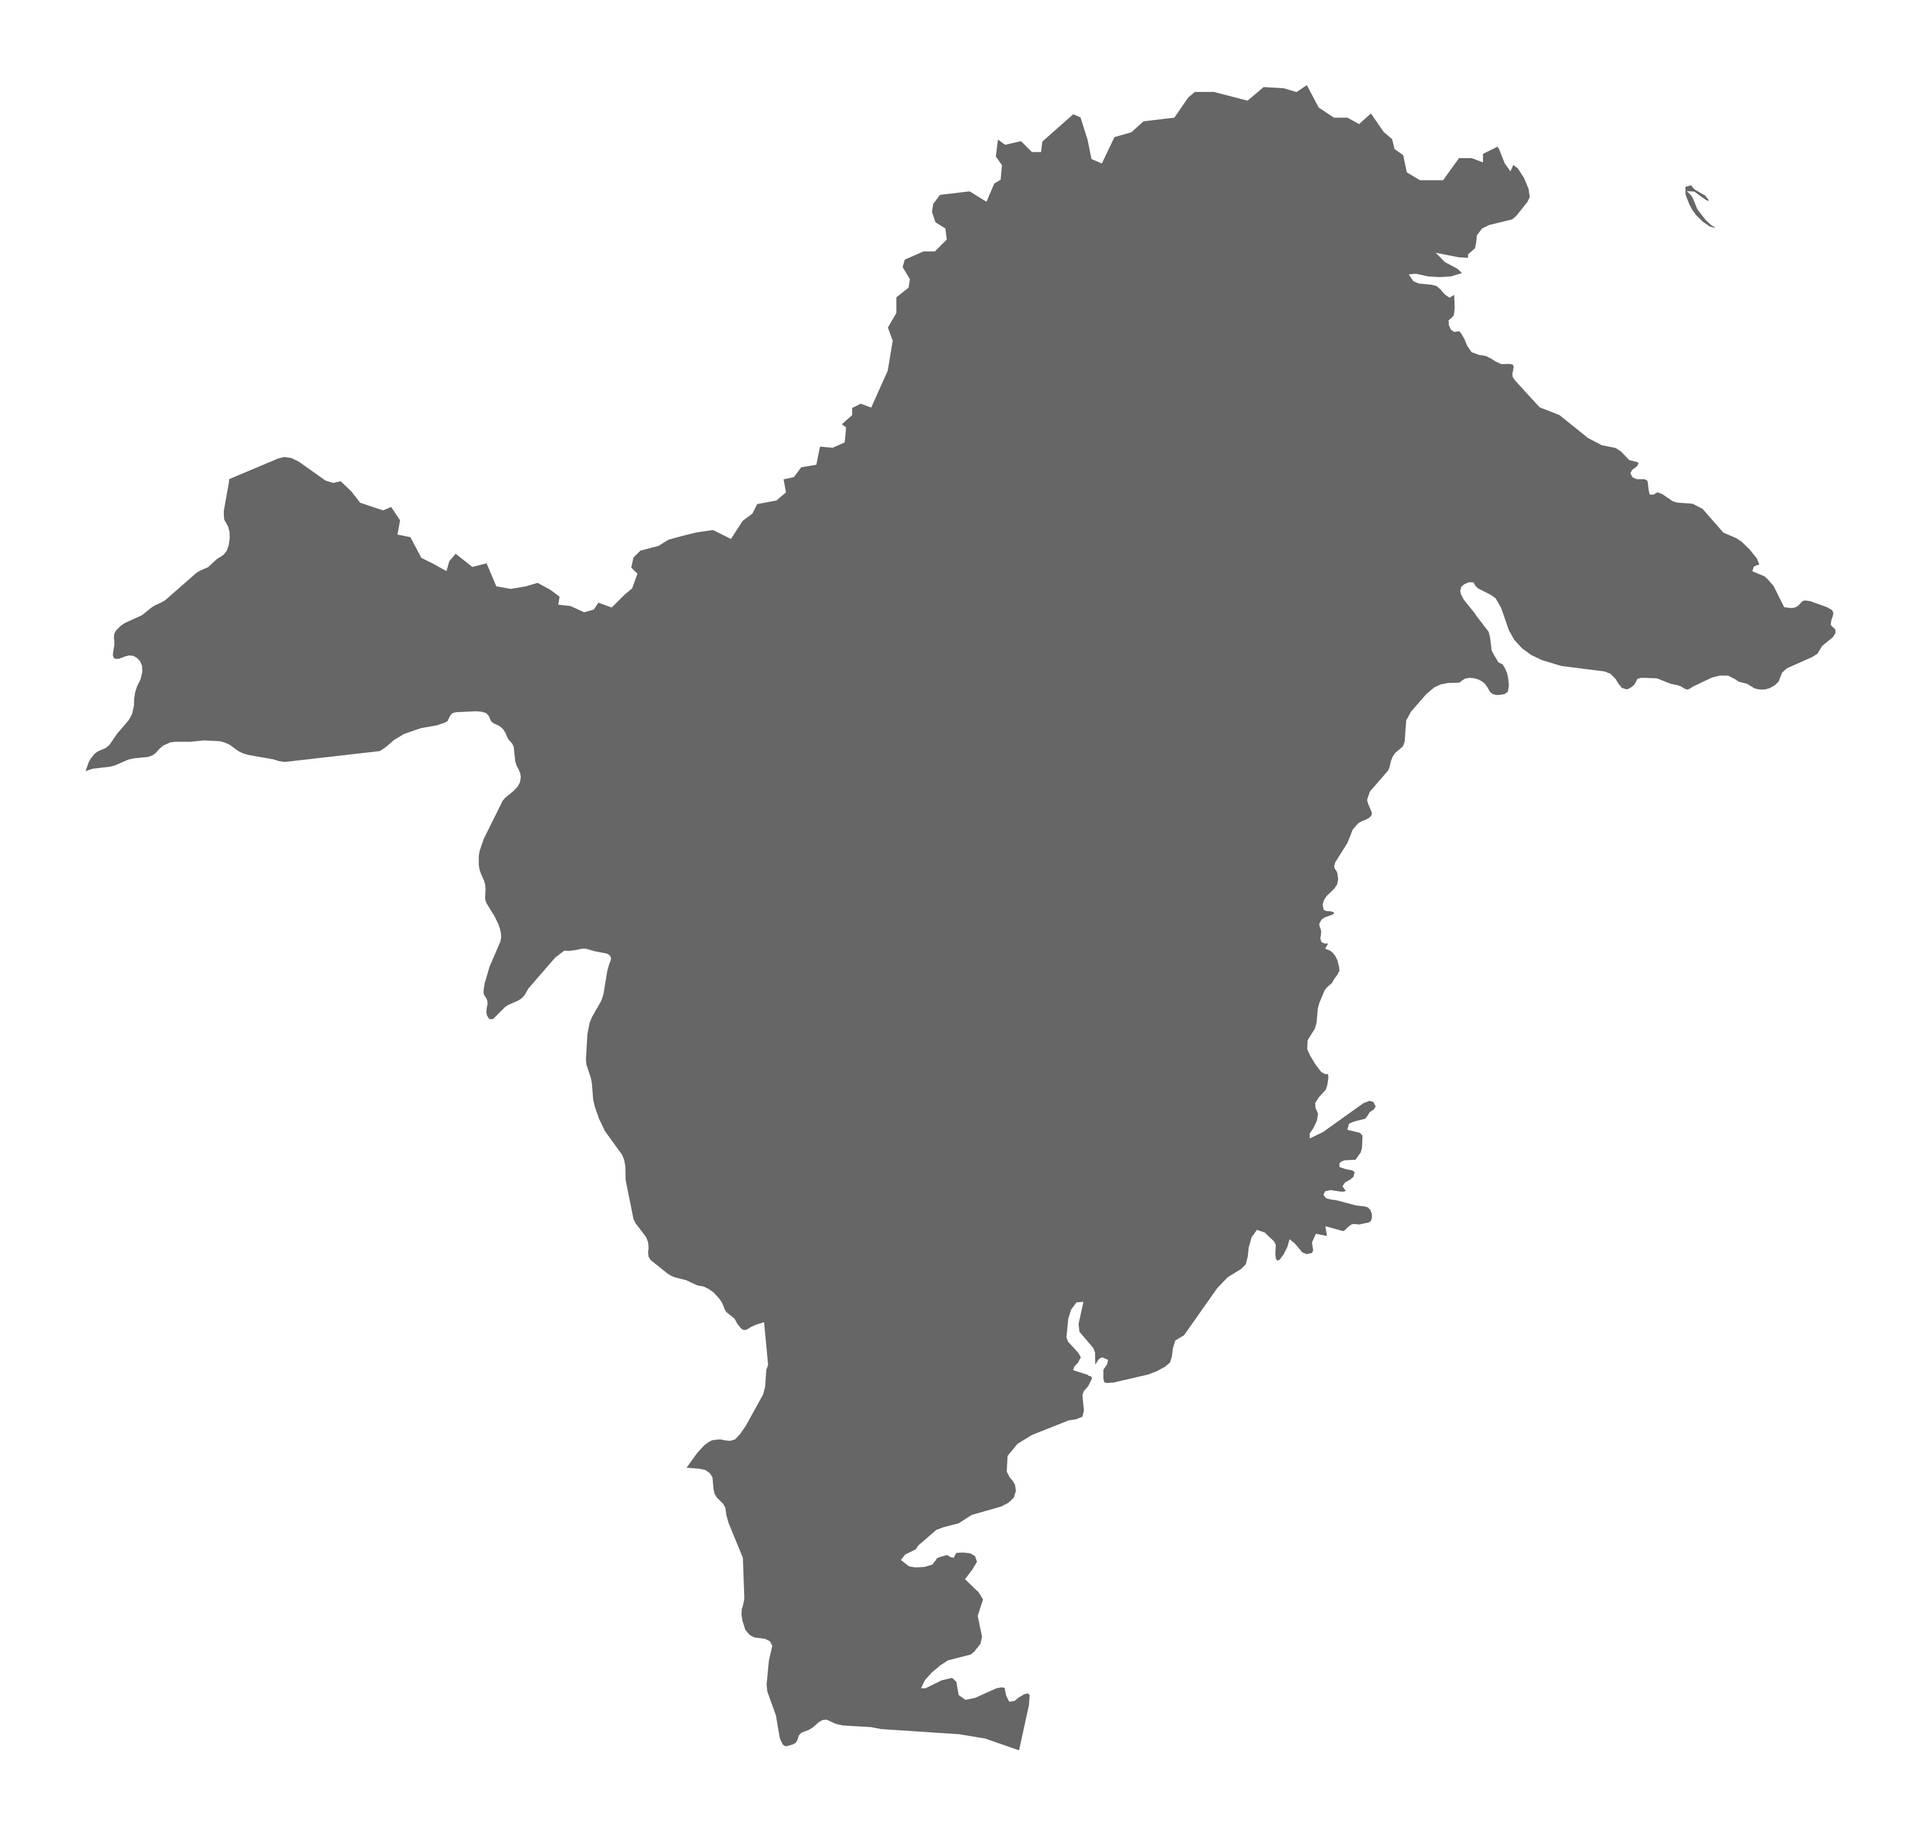 Peta Kalimantan Timur